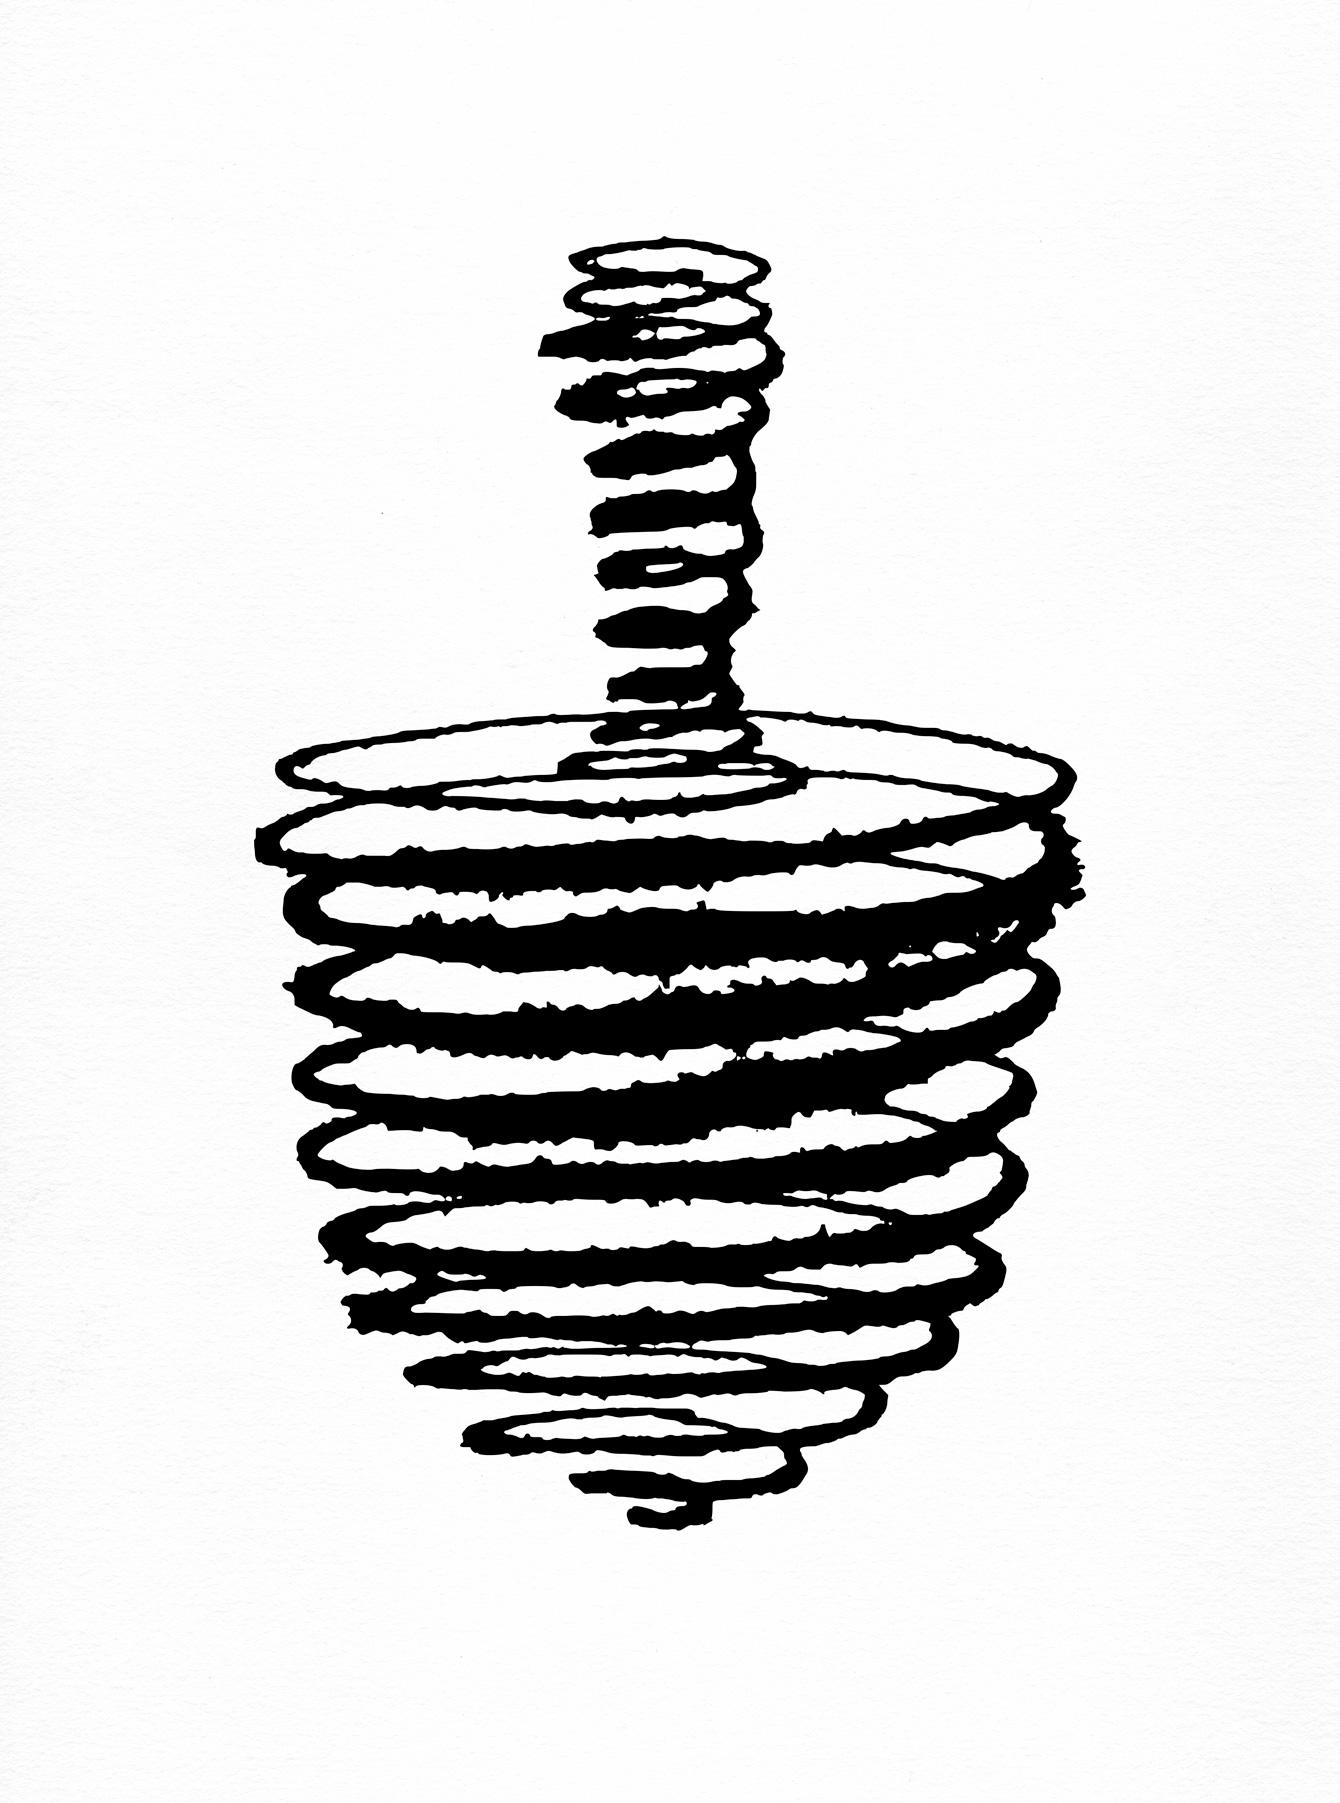 Dreidel Drawing at GetDrawings.com | Free for personal use Dreidel ...